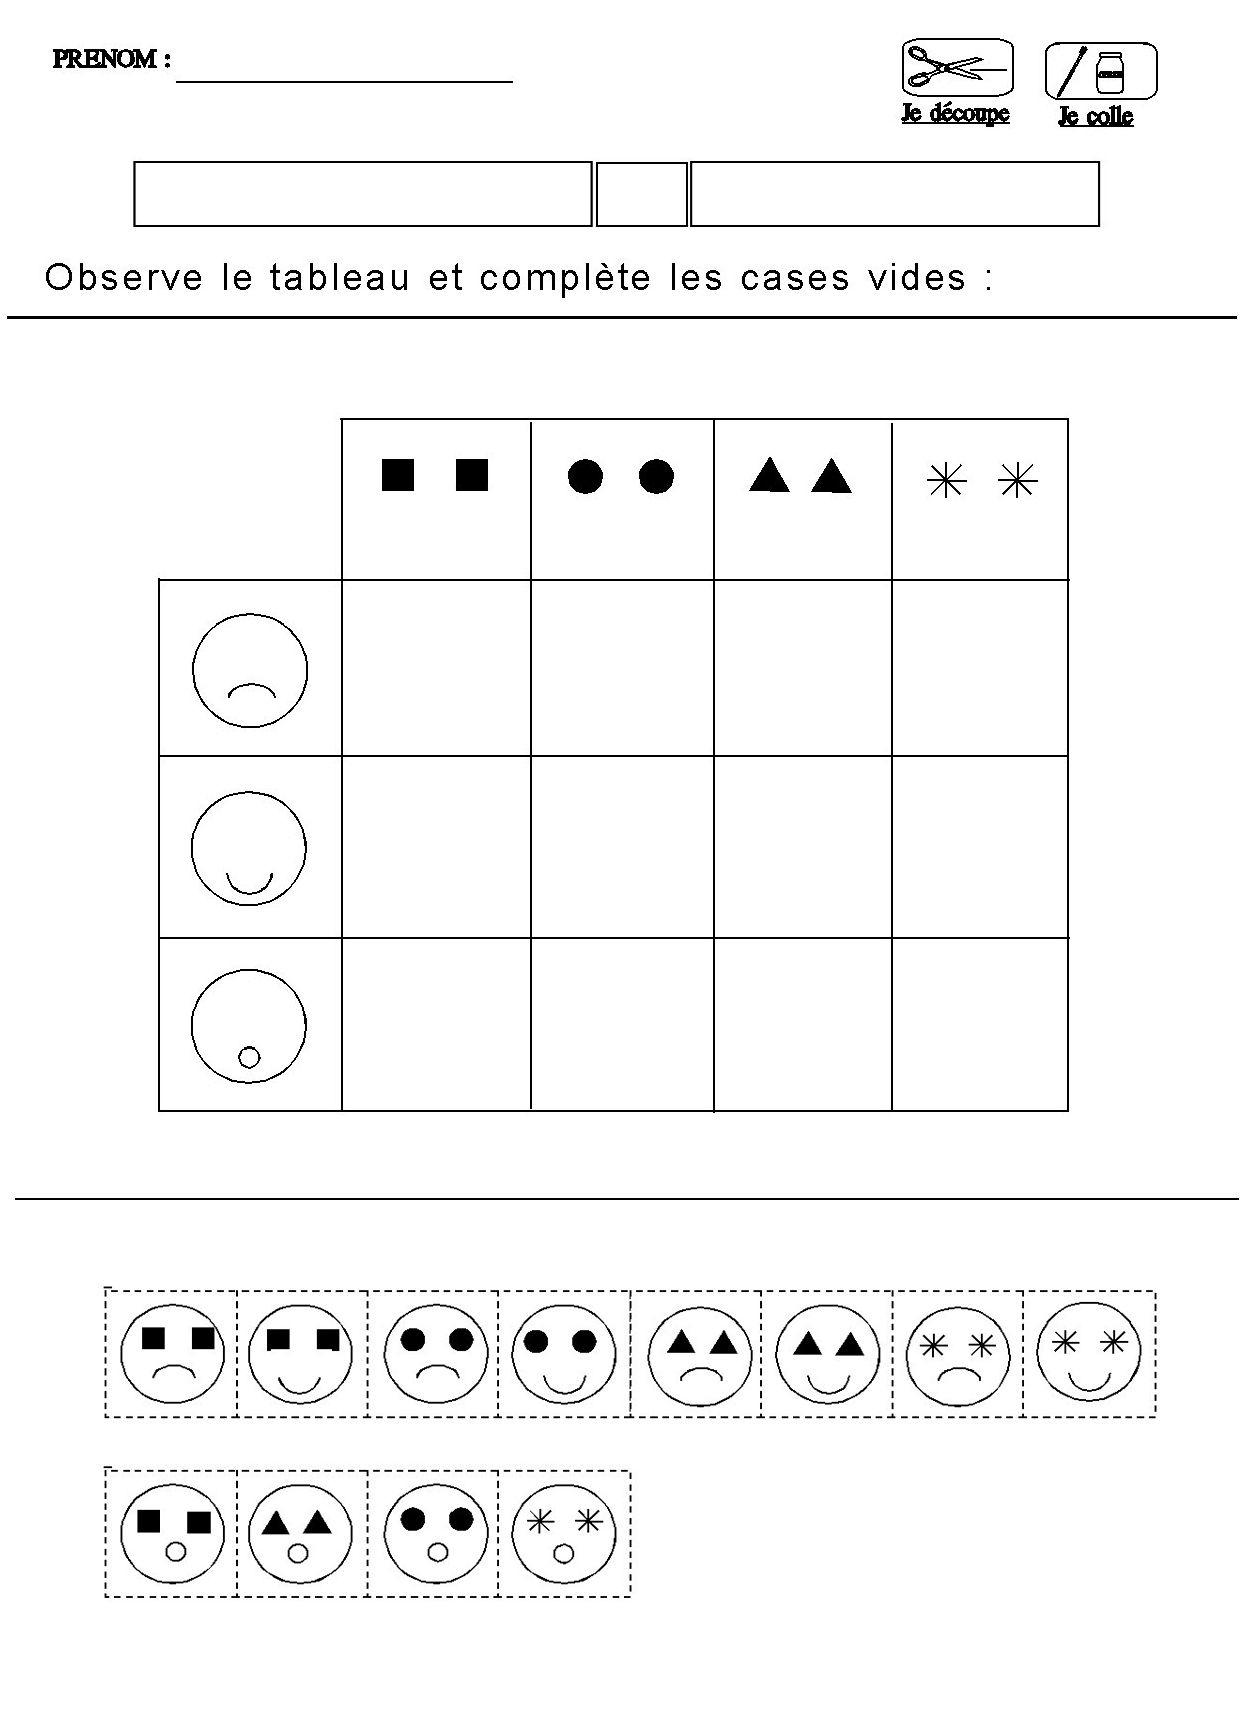 Tableau Double Entrees Pour Maternelle Moyenne Section serapportantà Exercice Maternelle Petite Section